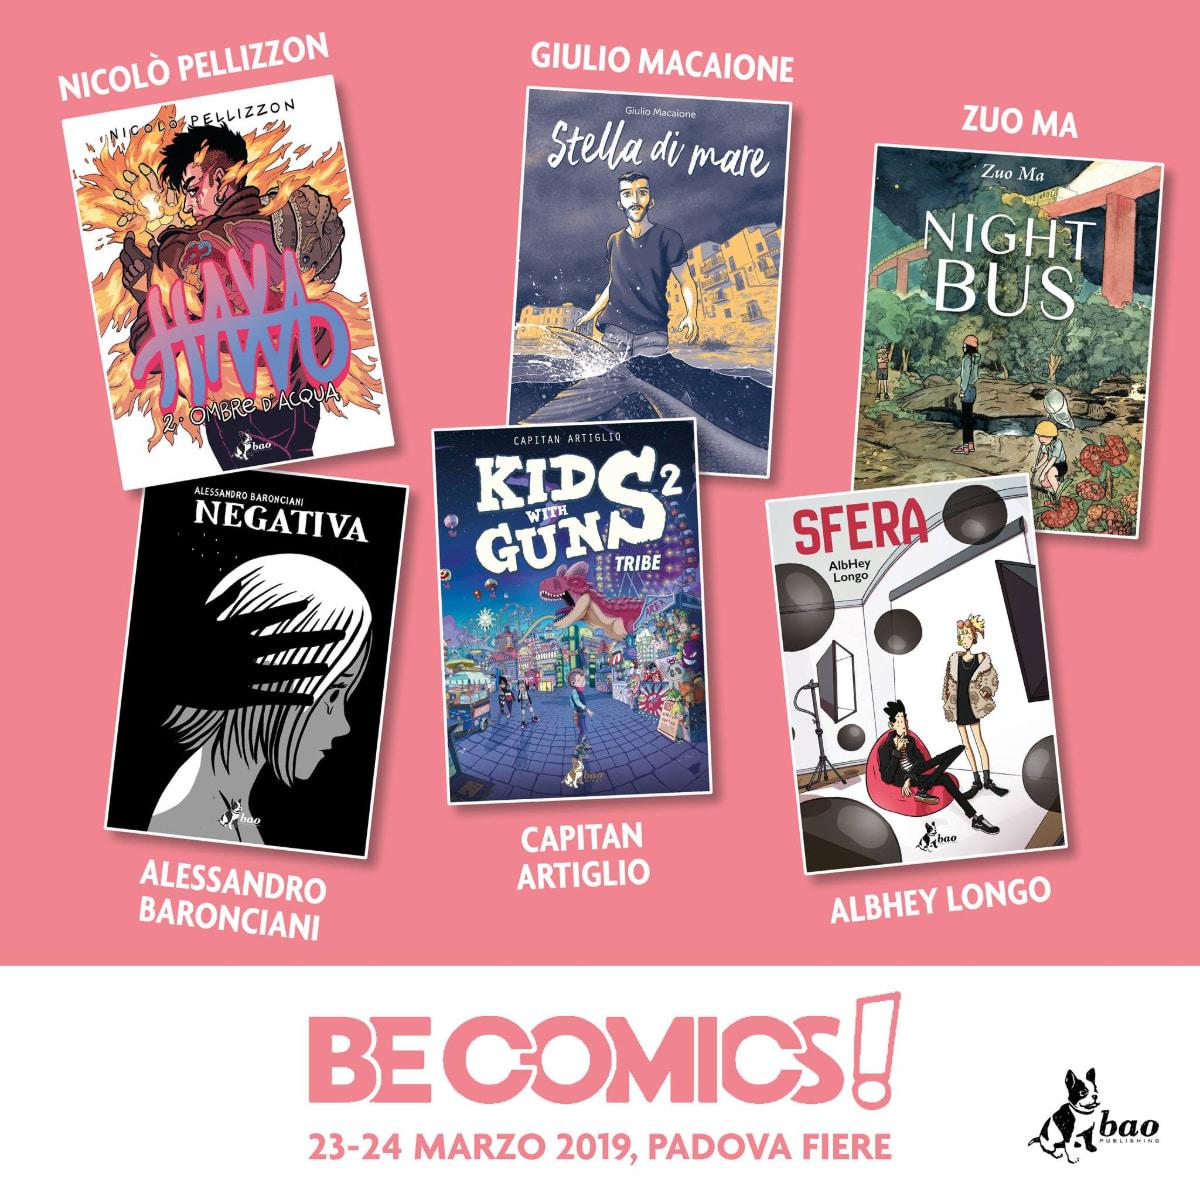 be comics 2019 bao publishing ospiti